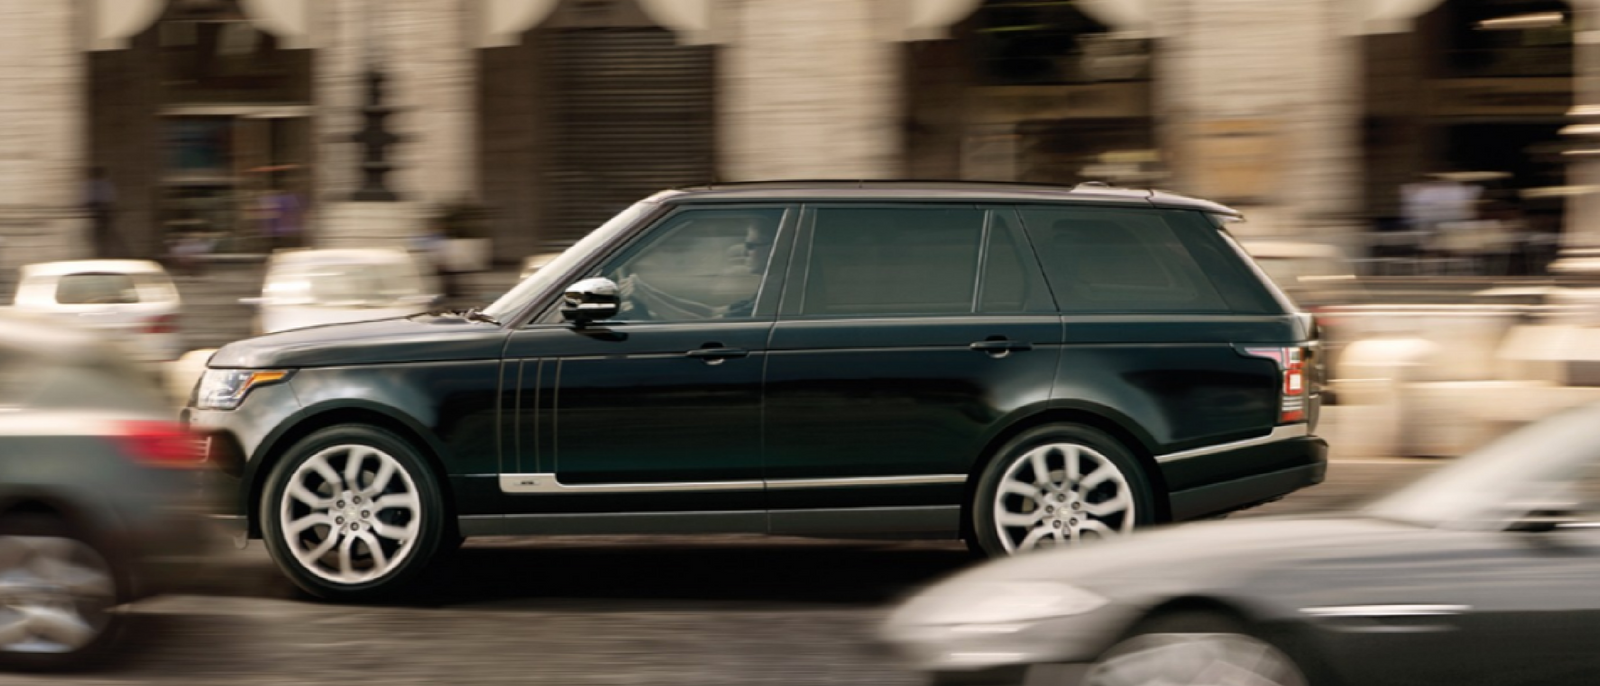 2016 Range Rover Exterior